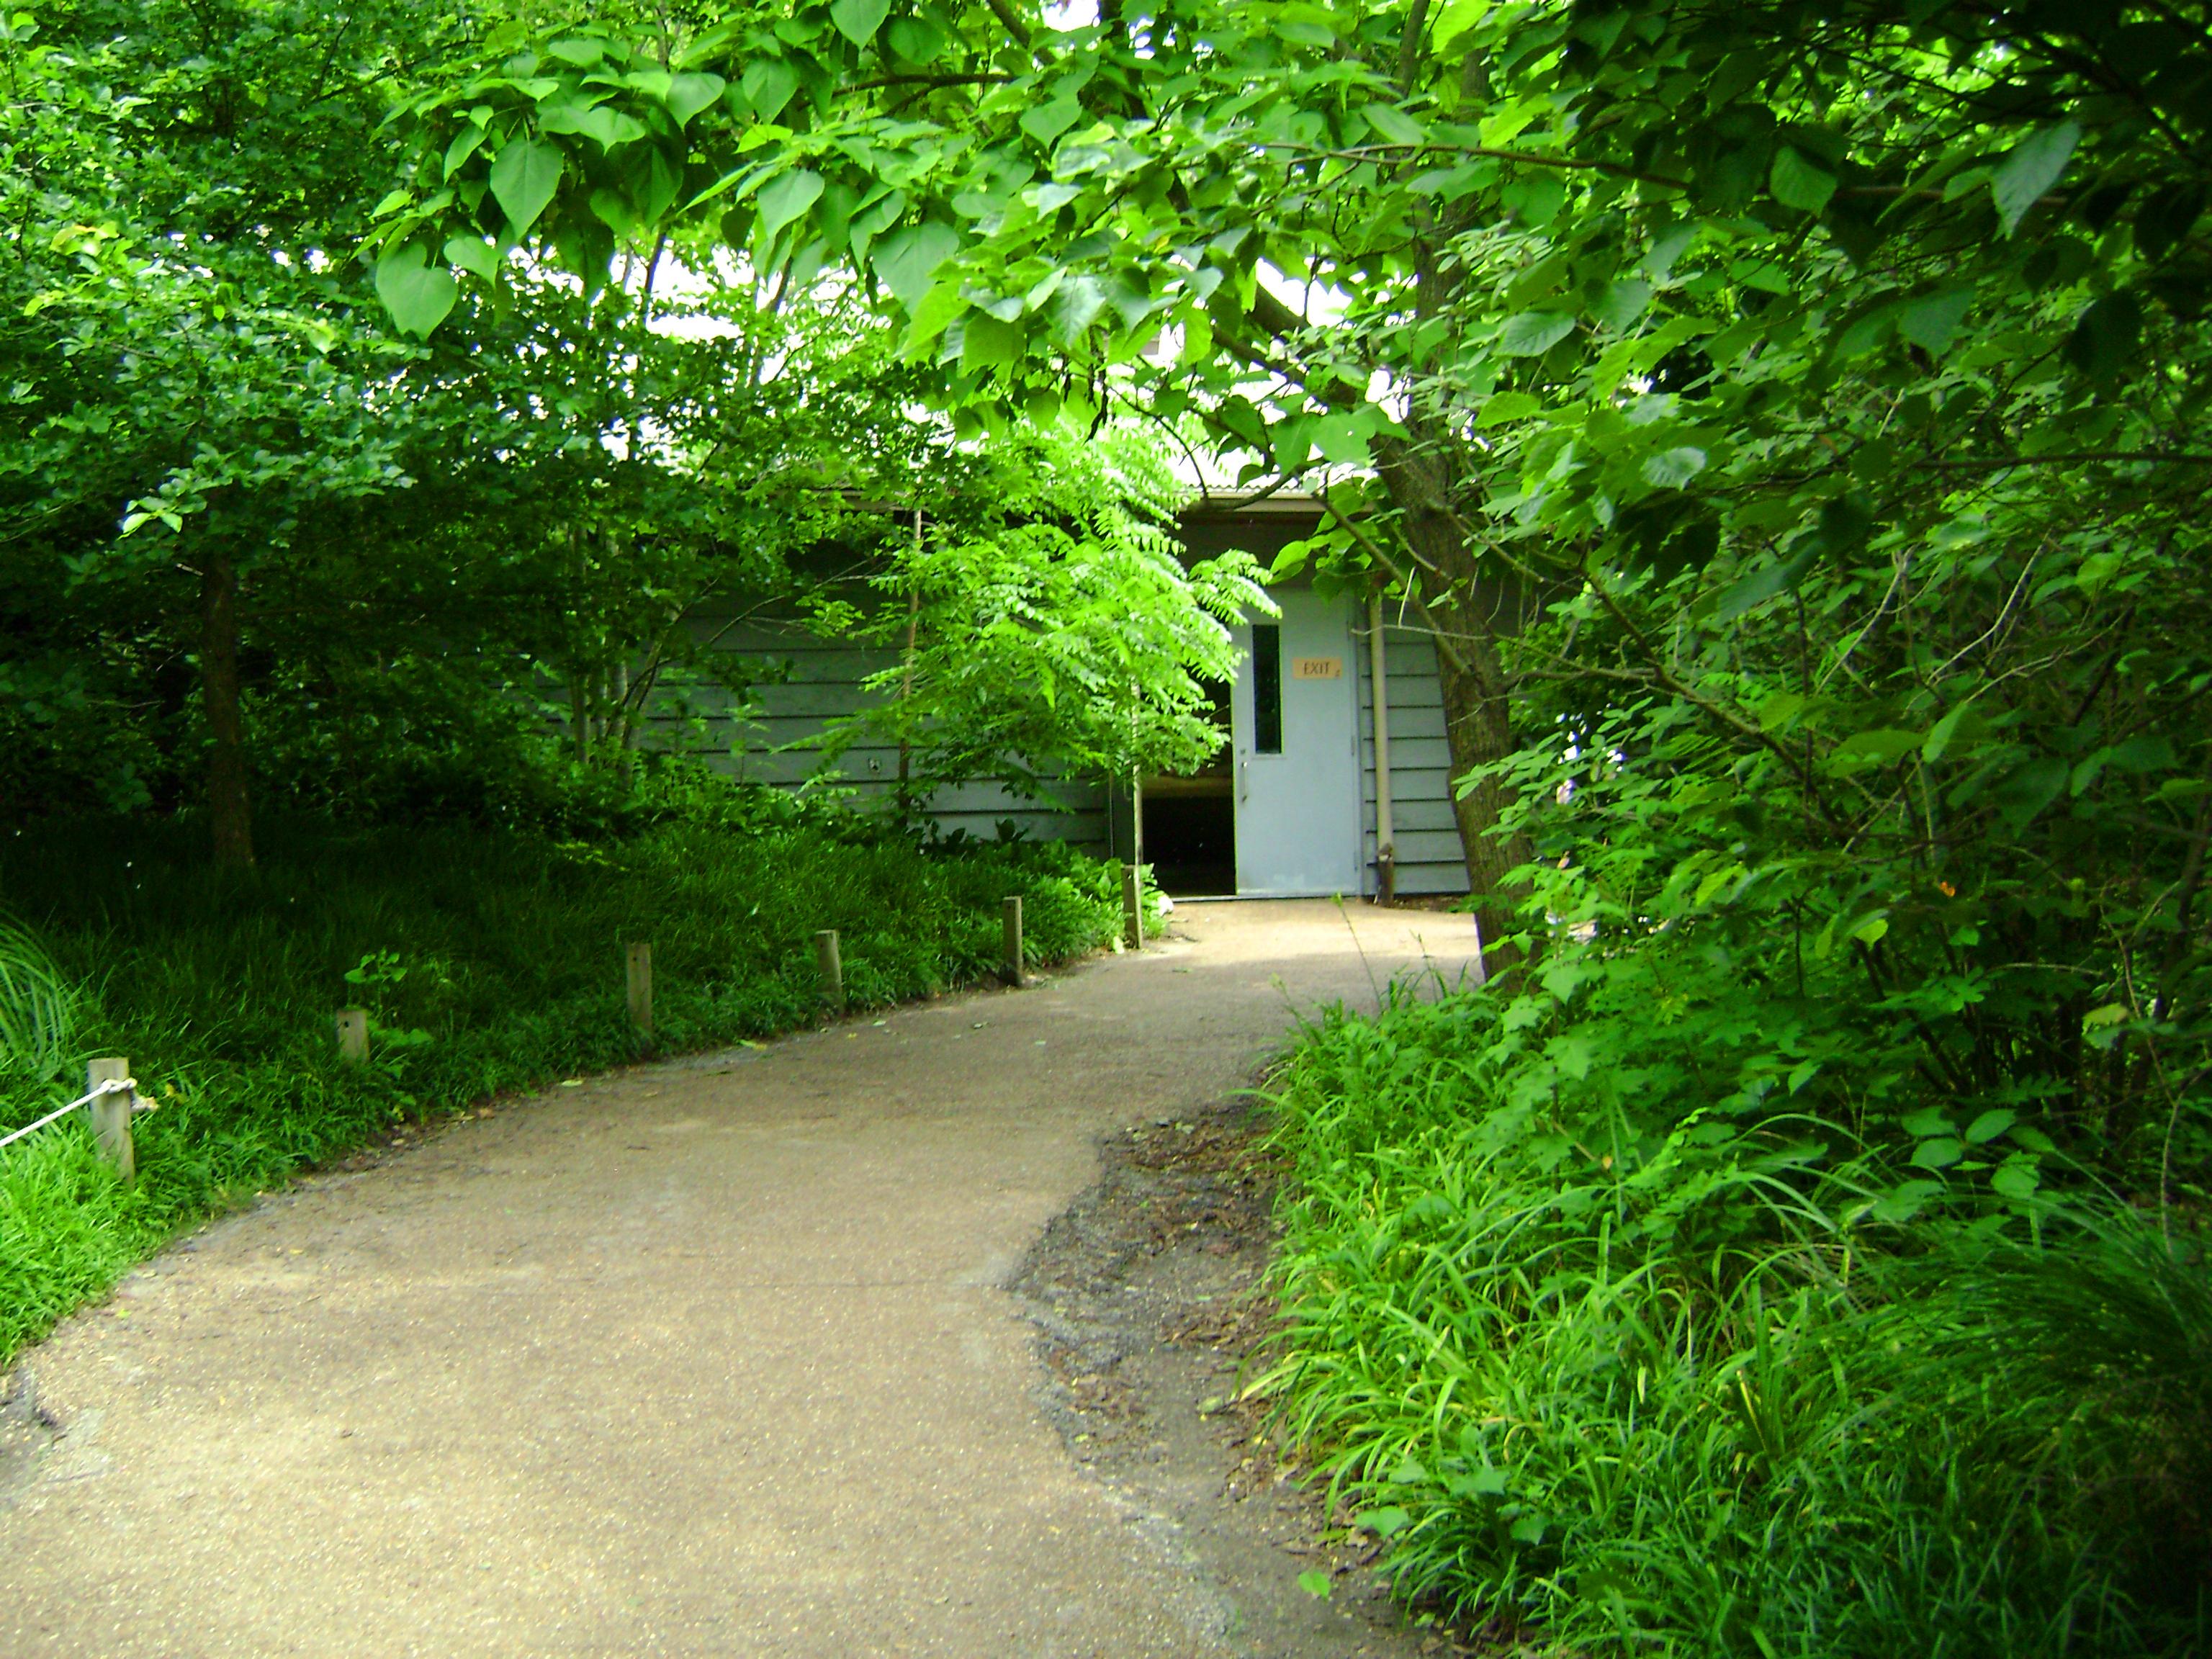 Hidden Path, Green, Hut, Landscape, Nature, HQ Photo